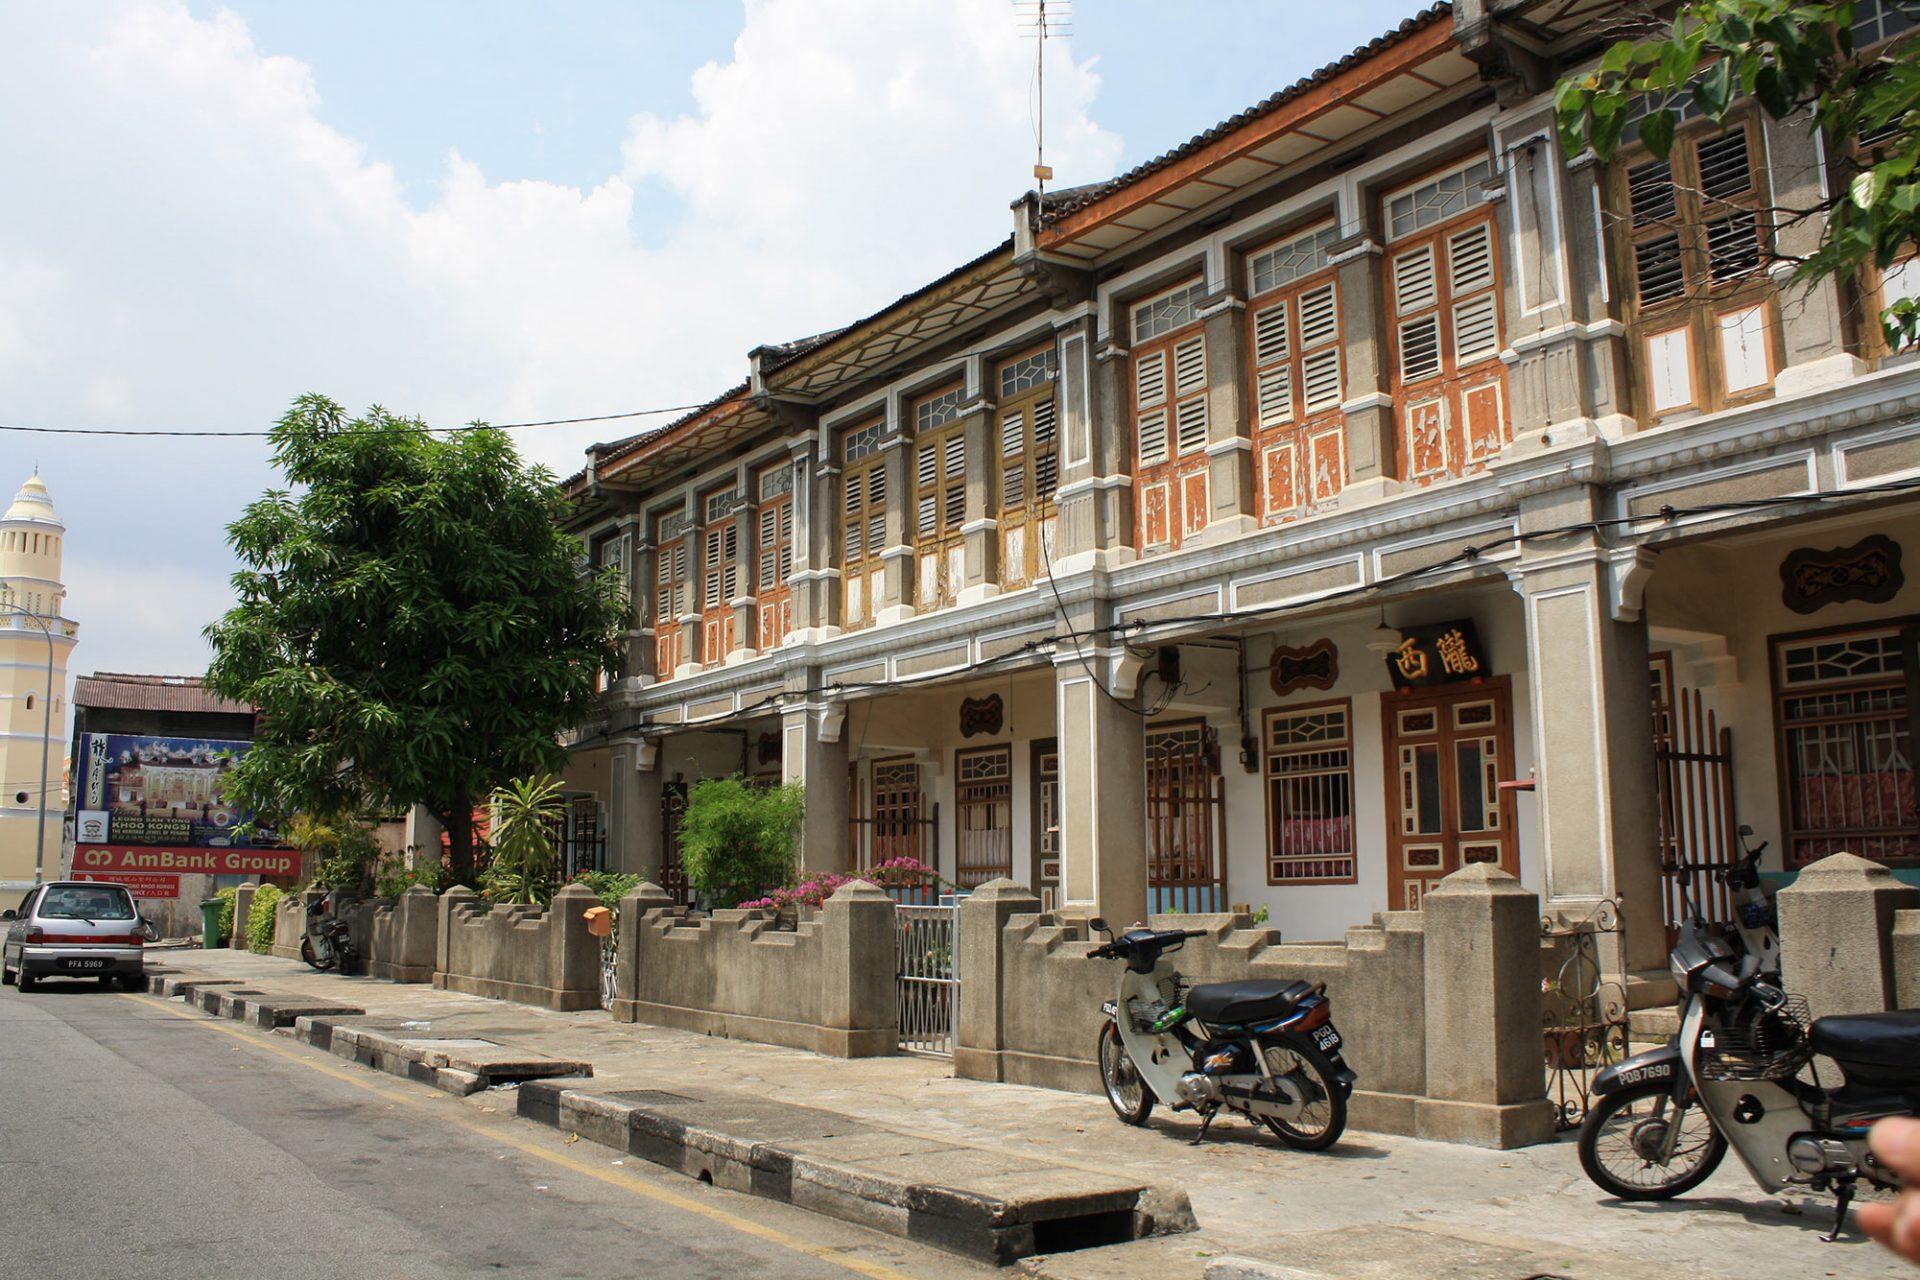 Penang rue street